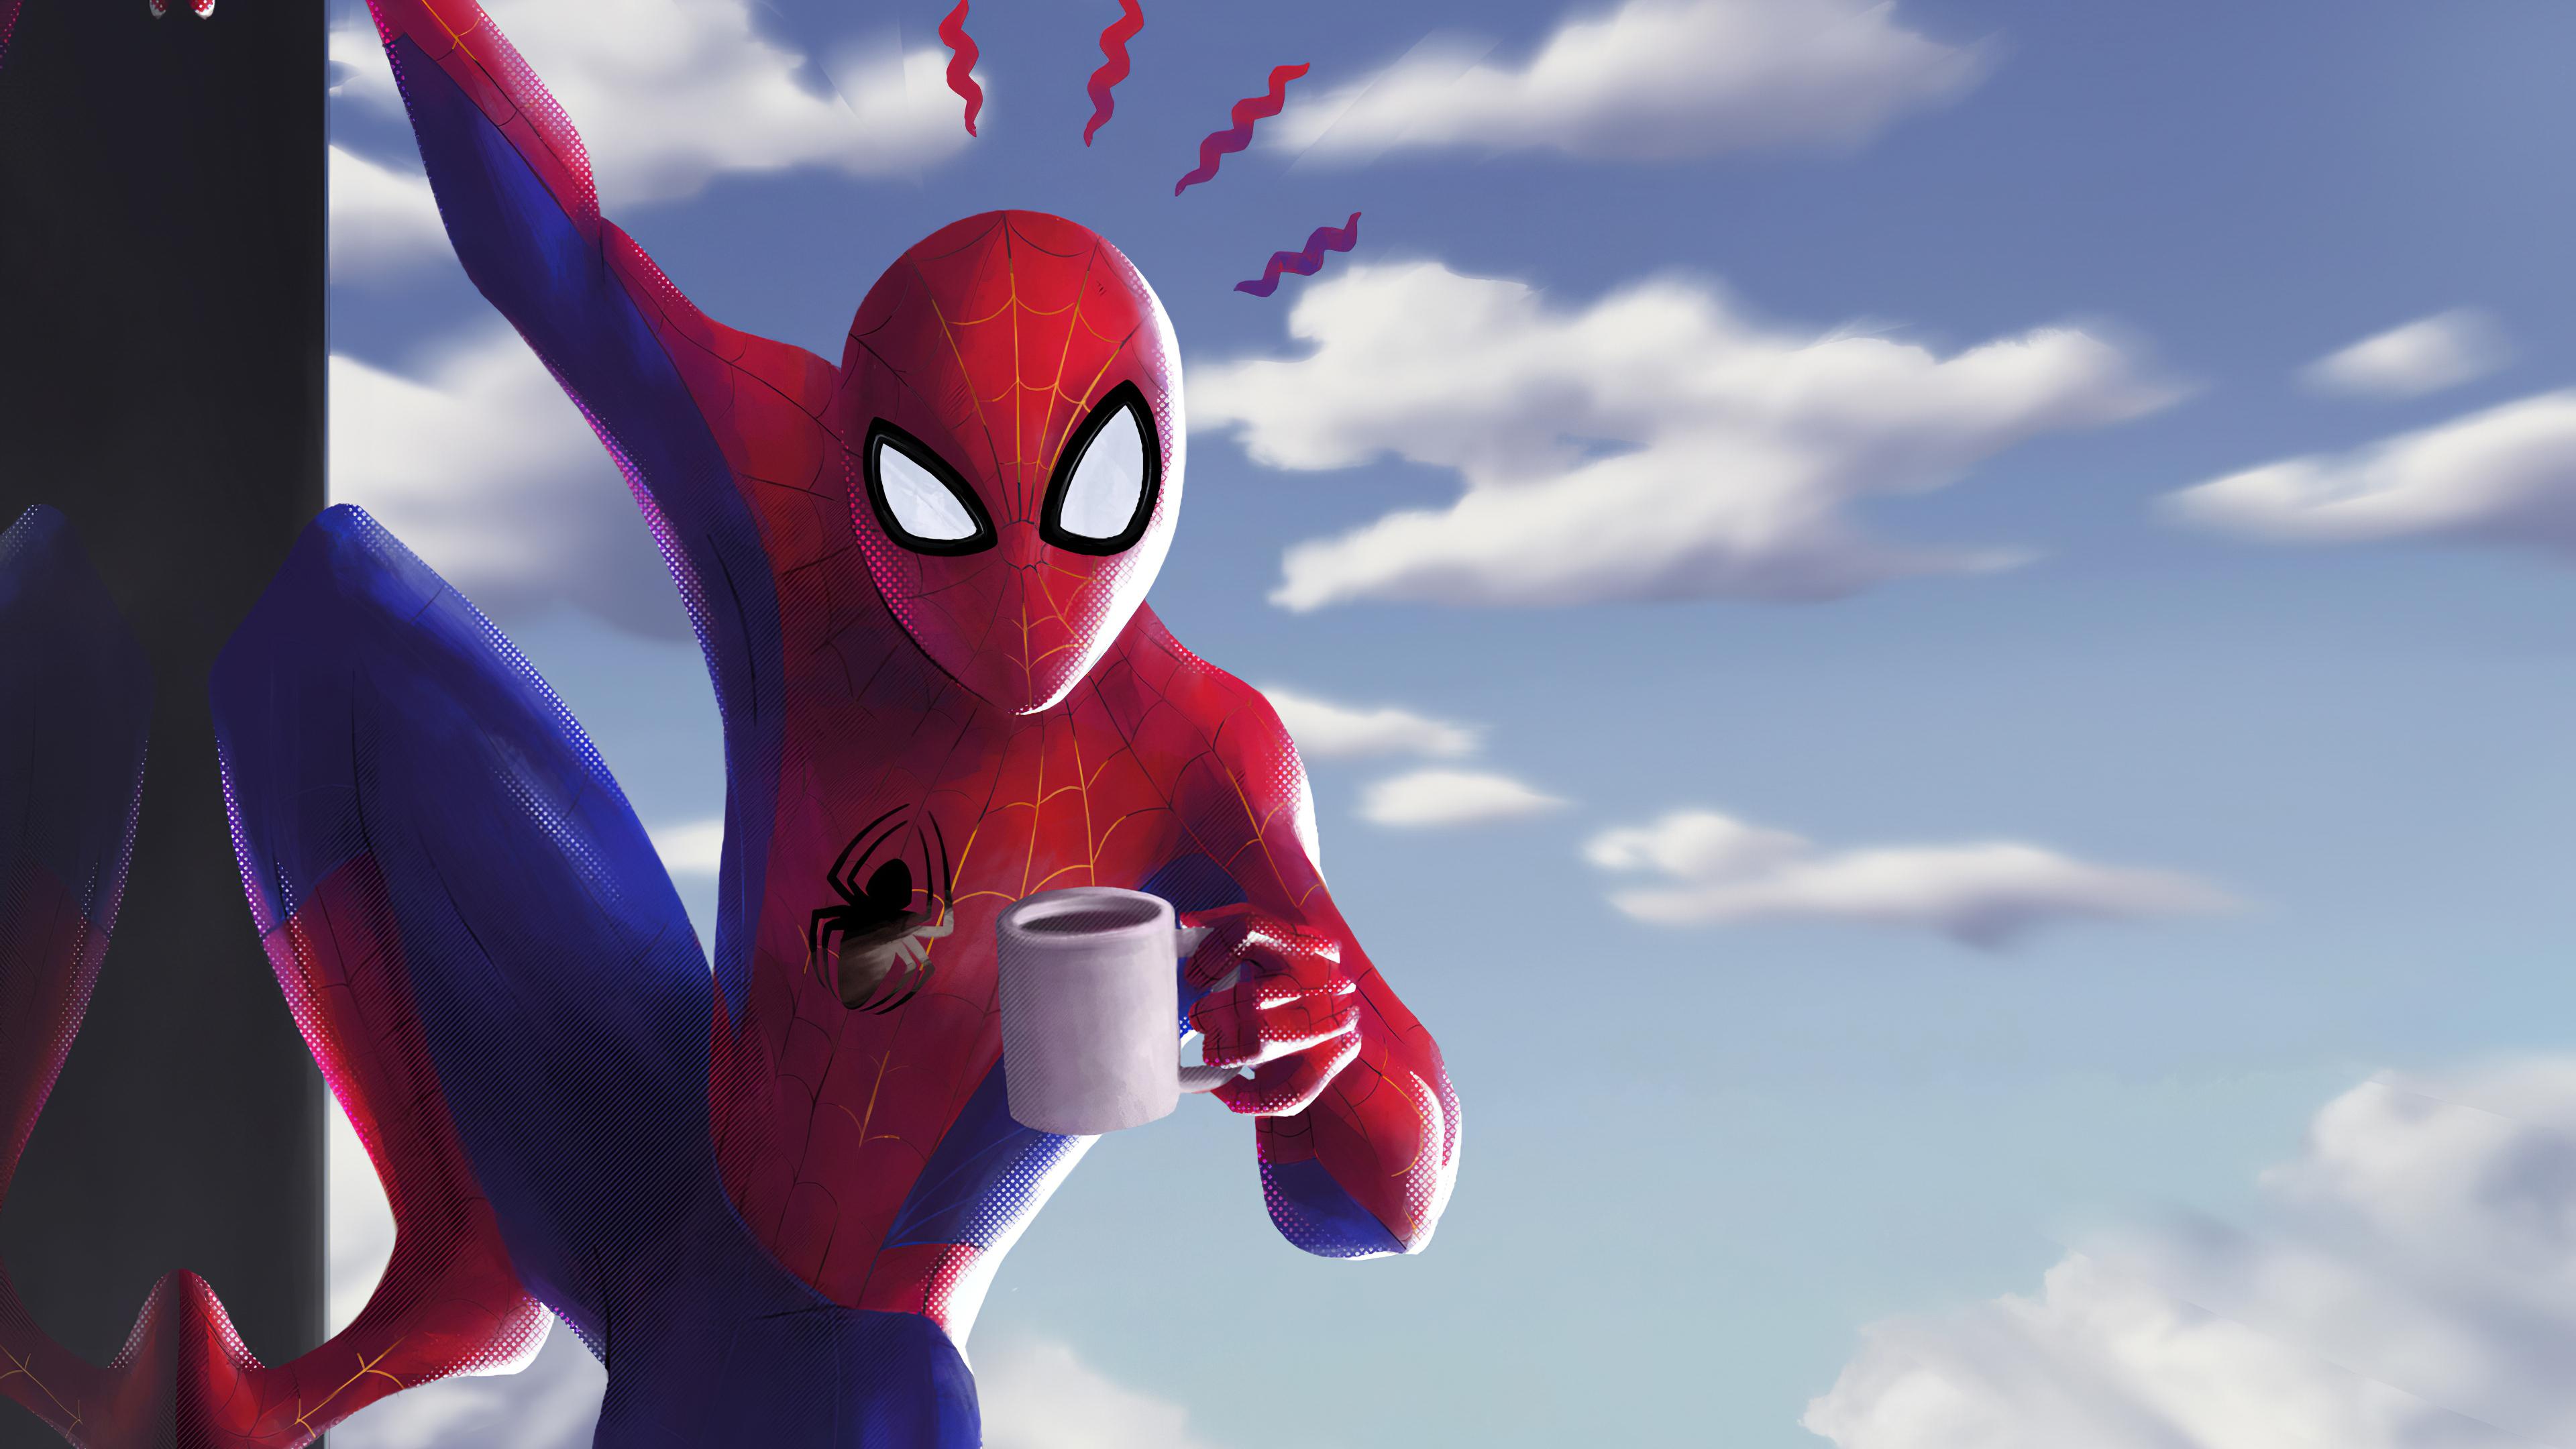 spider man with coffe 1581357162 - Spider Man With Coffe - Spider man wallpapers, spider man wallpaper phone 4k hd, spider man background hd 4k, spider man 4k wallpaper